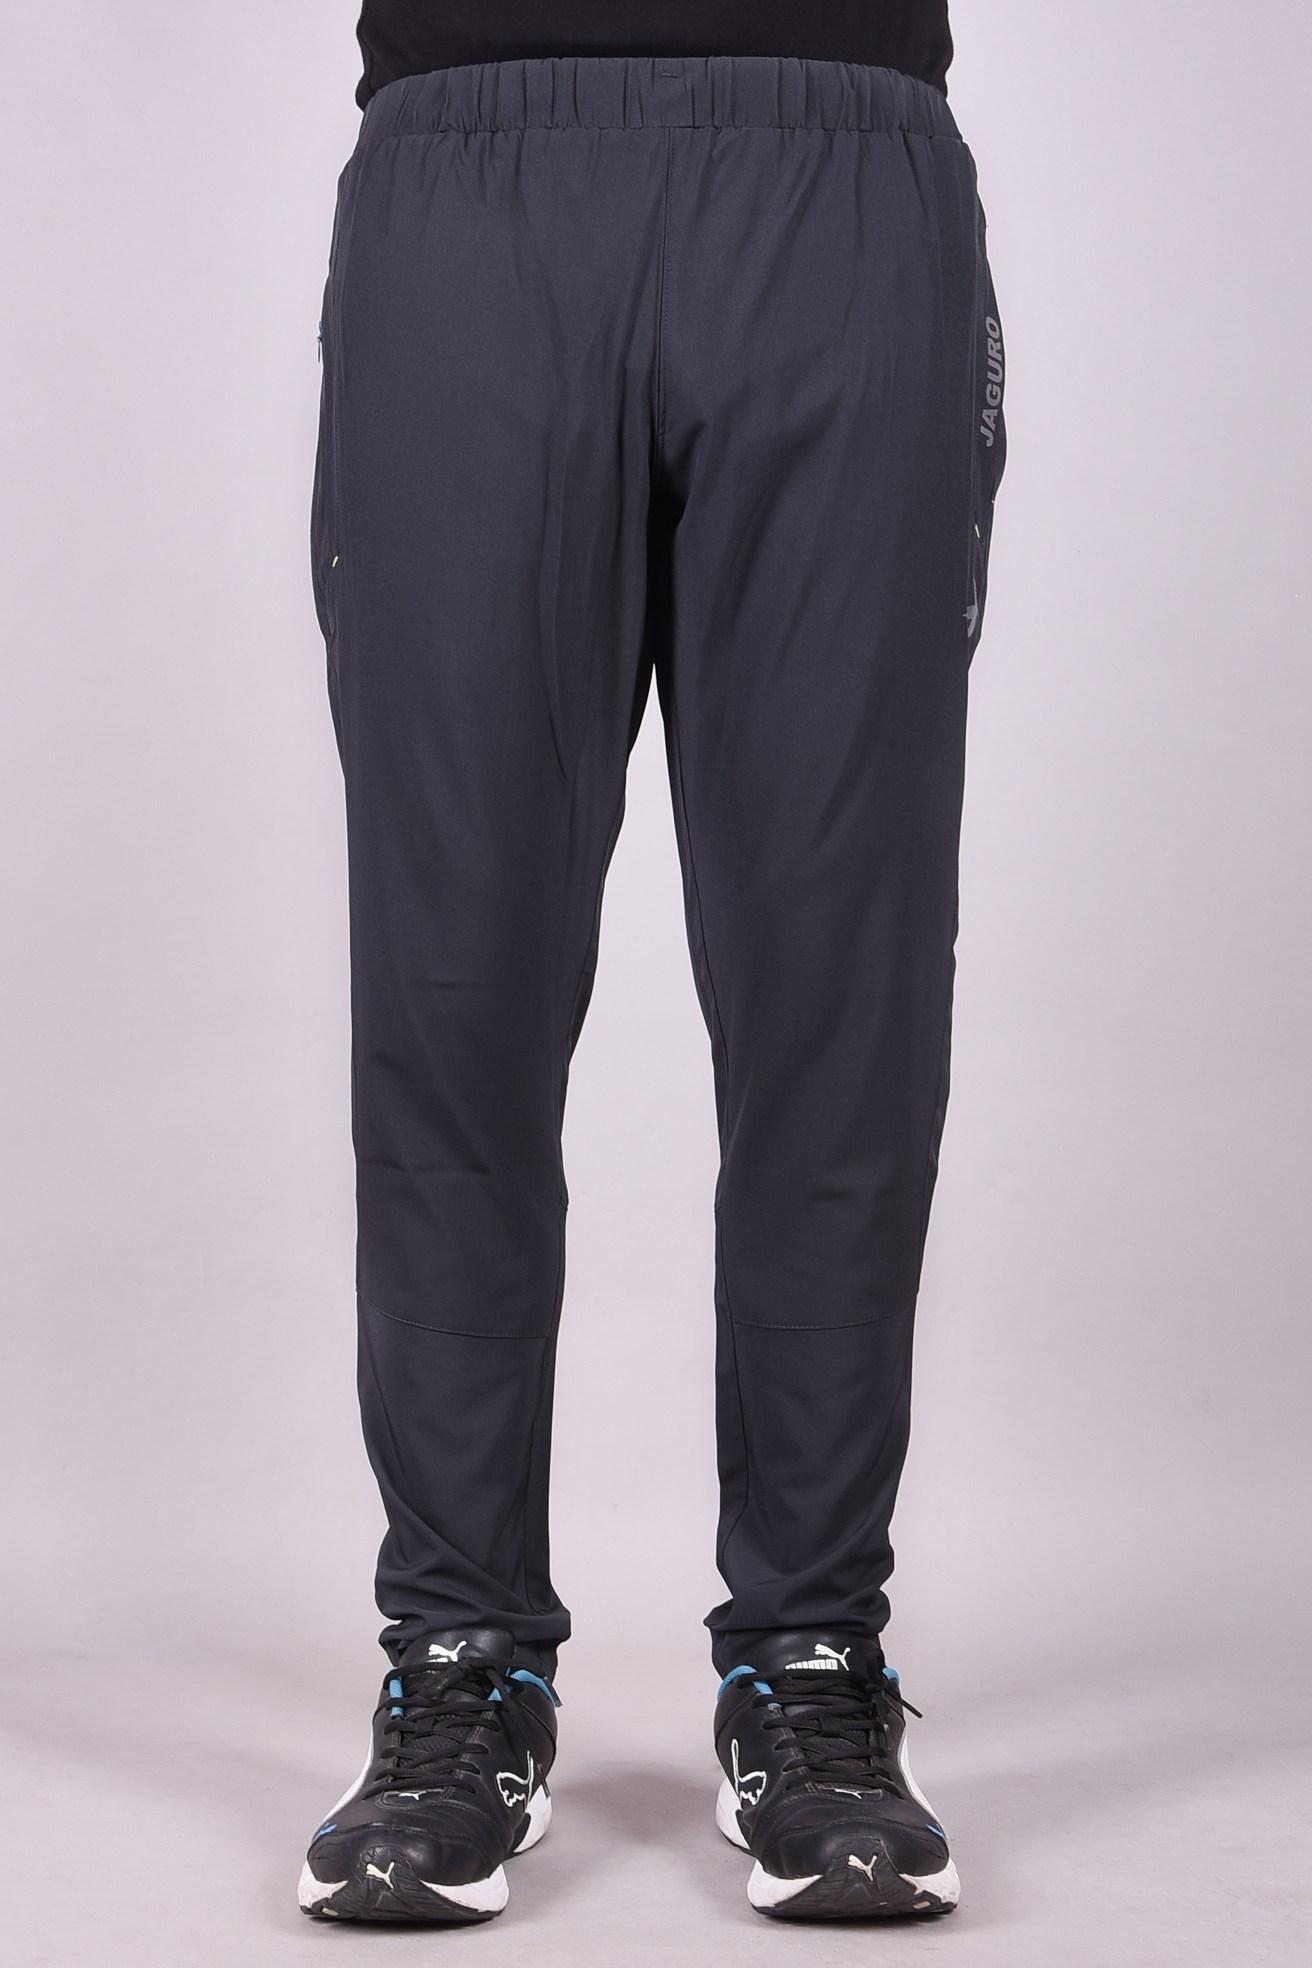 JAGURO | Men's Polyester Stylish Dual Pockets Trackpant.